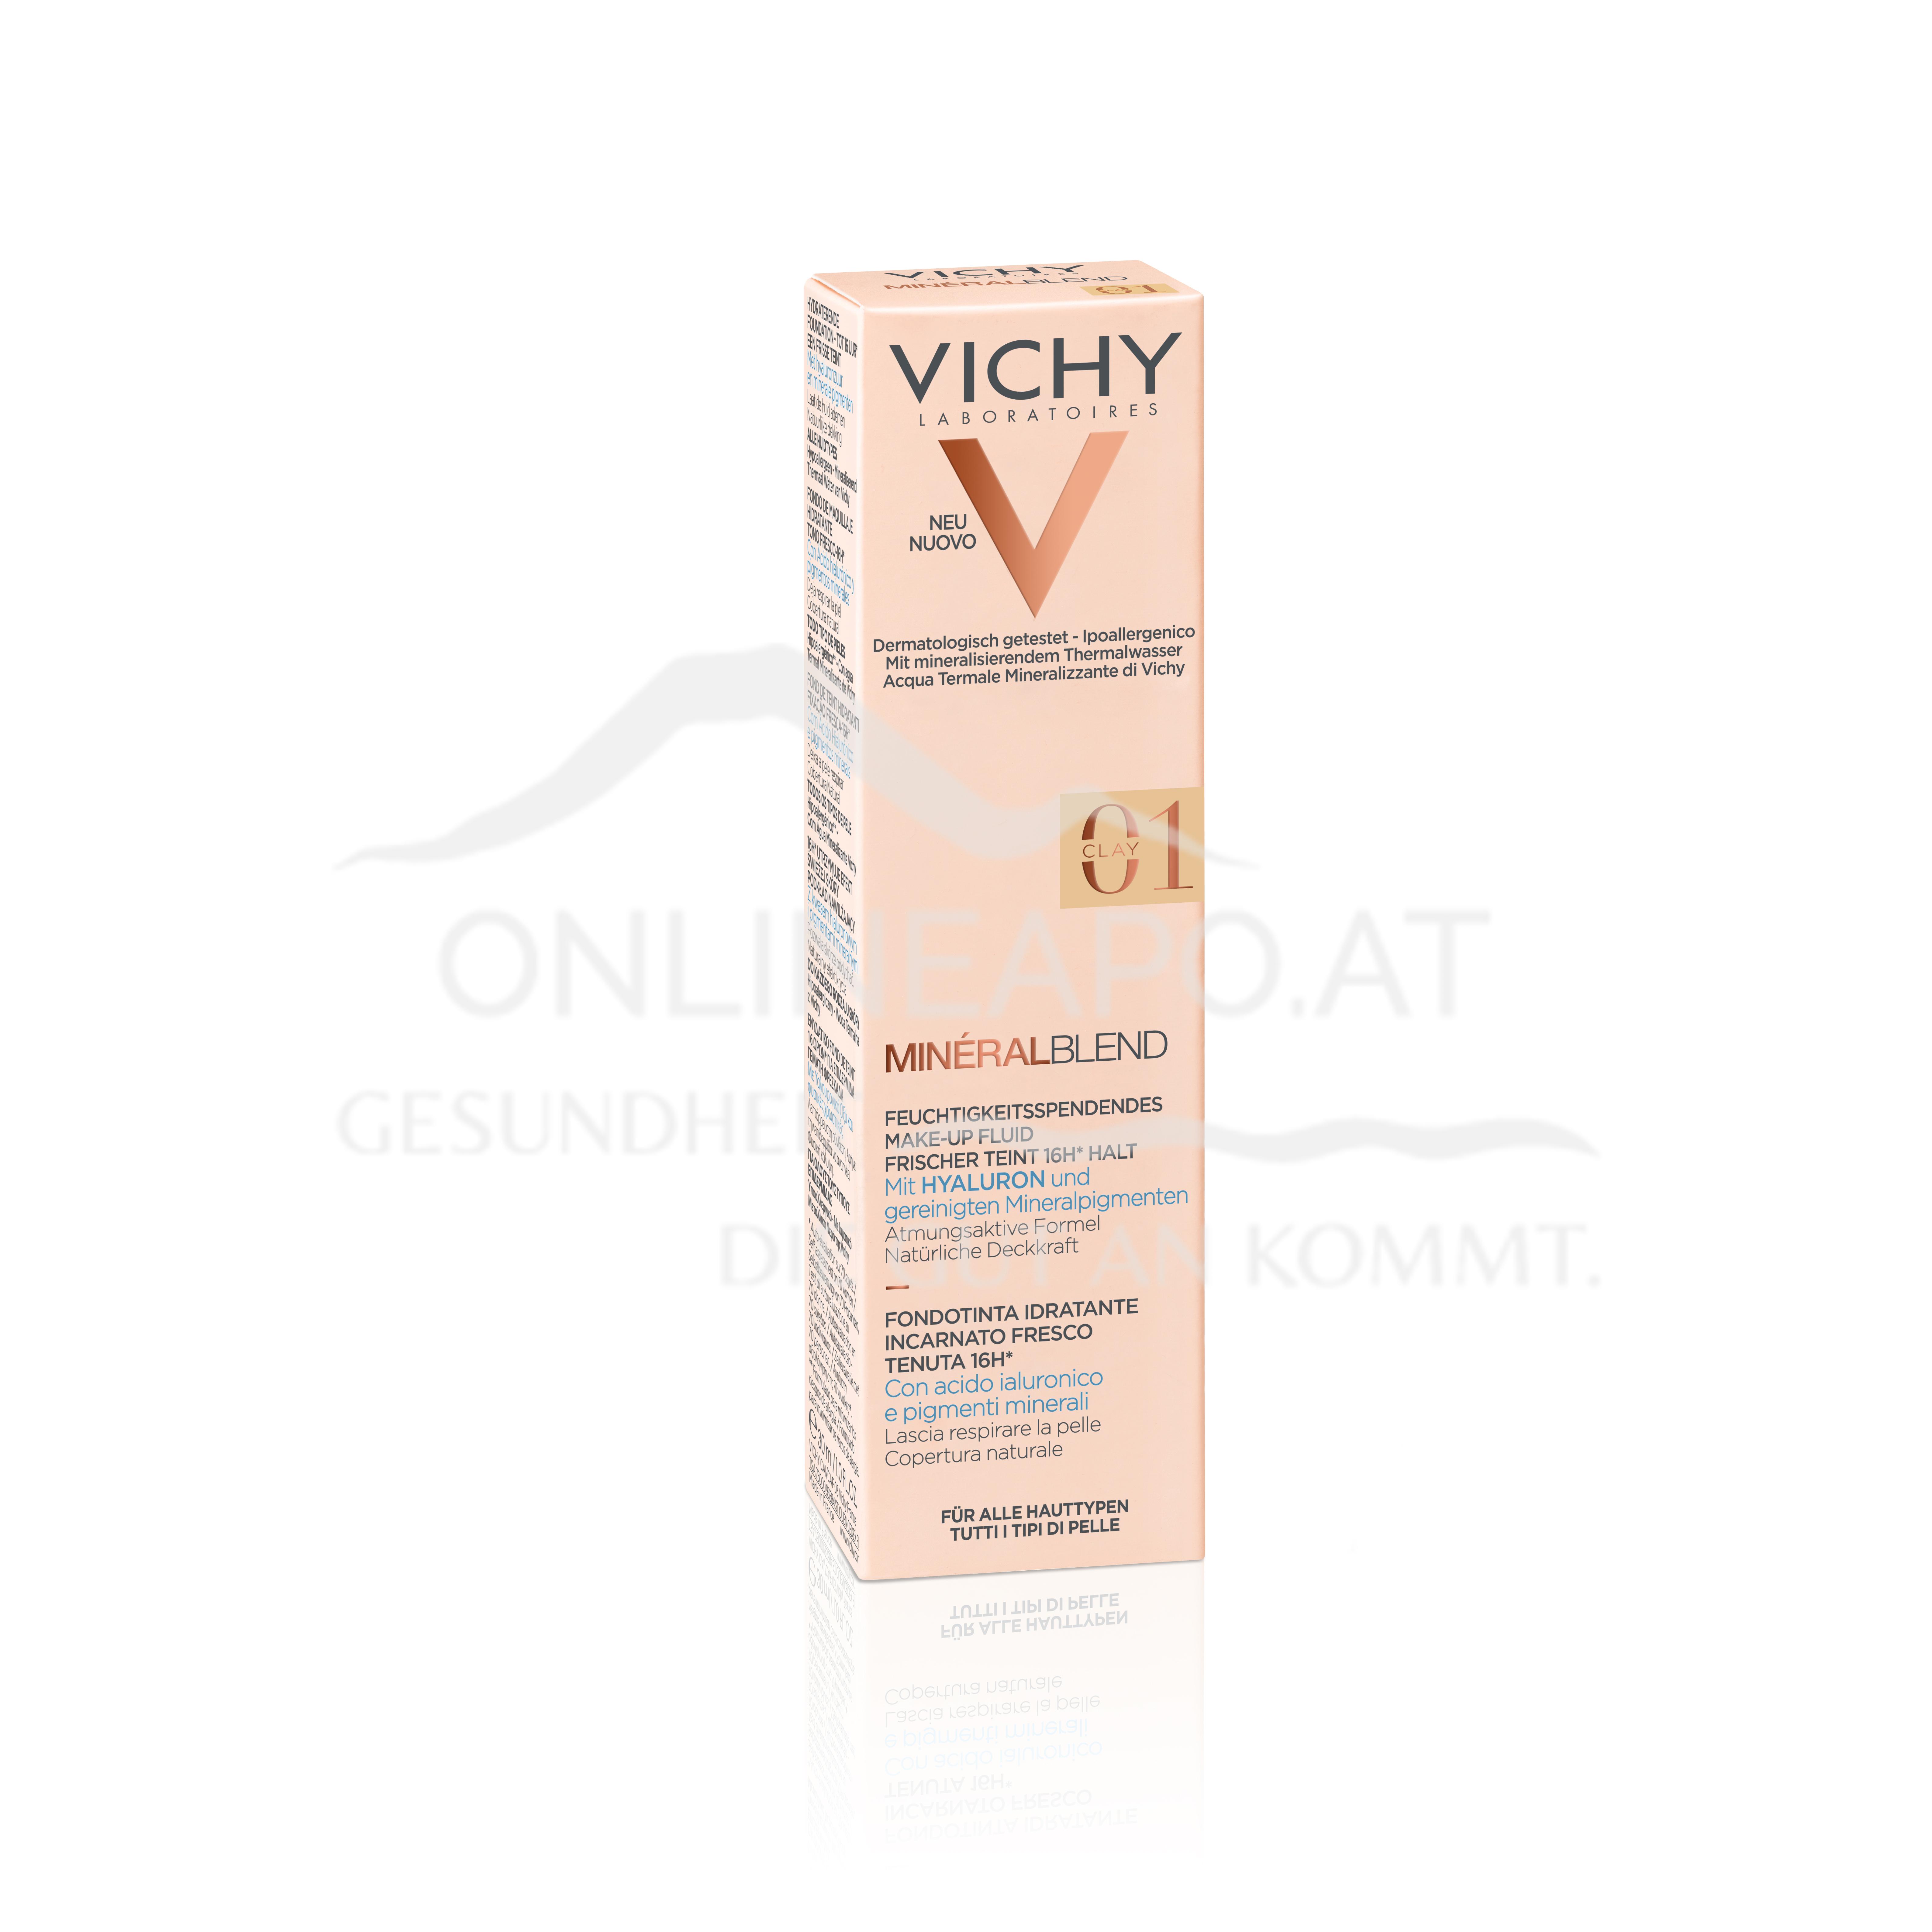 VICHY Mineralblend Fluid 01 - Clay